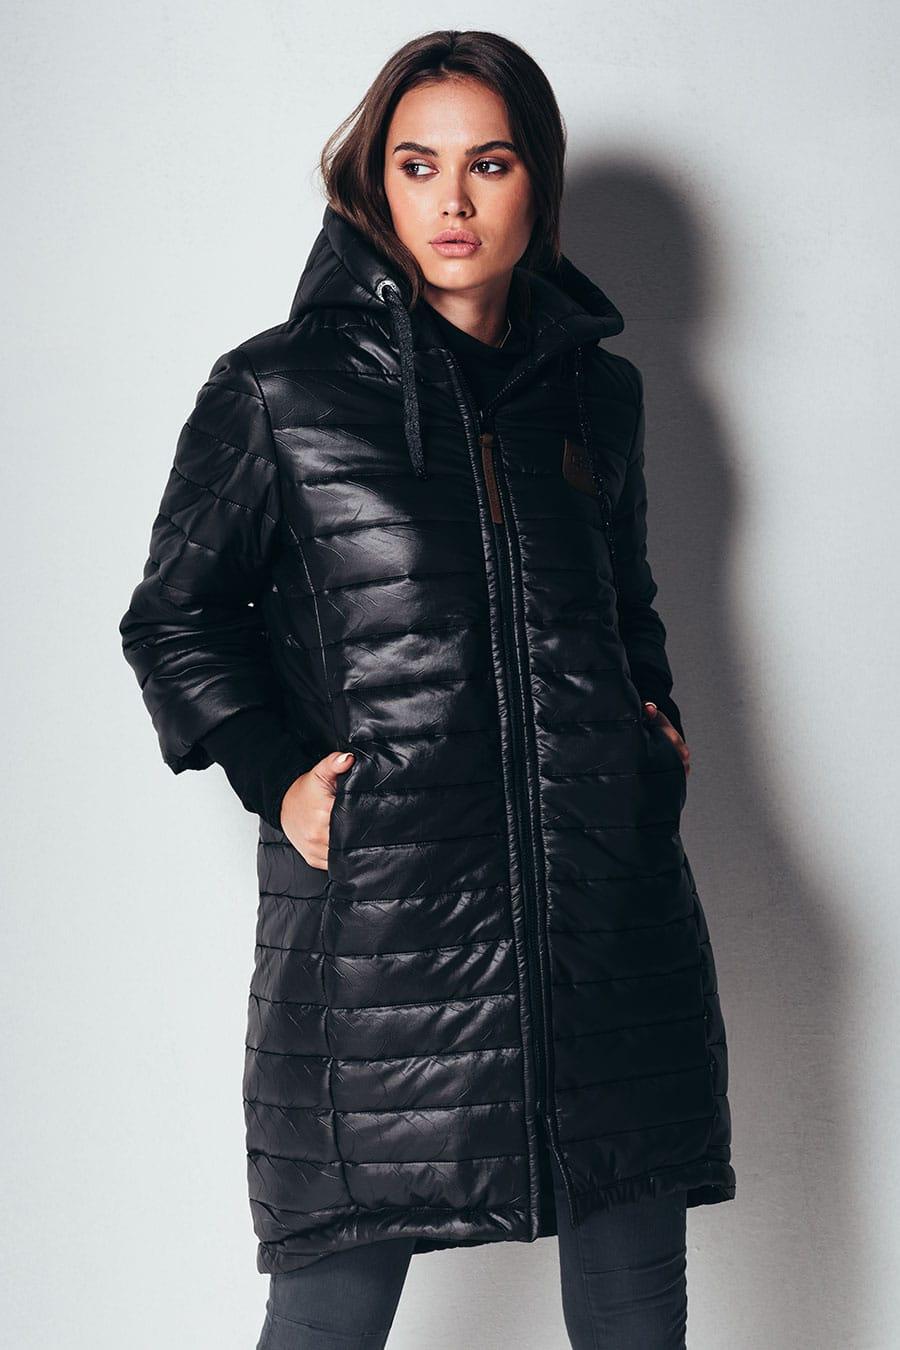 jagger internet prodavnica kolekcija jesen zima 2021 zenska jakna jg 6234 01 1